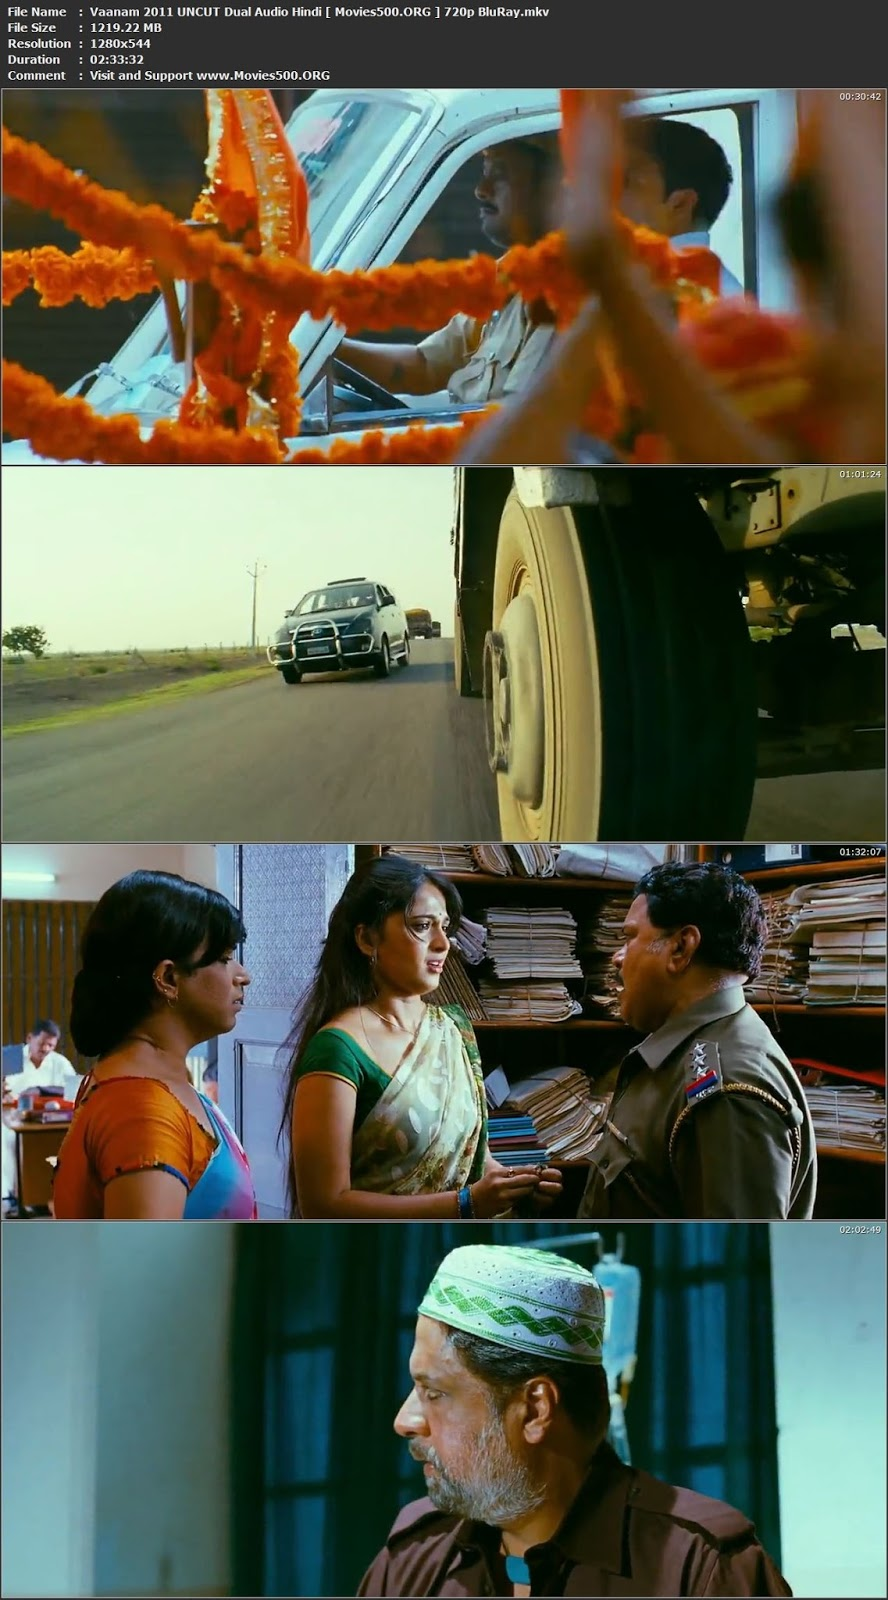 Vaanam 2011 UNCUT Dual Audio Hindi Download BluRay 720p 1GB at xcharge.net